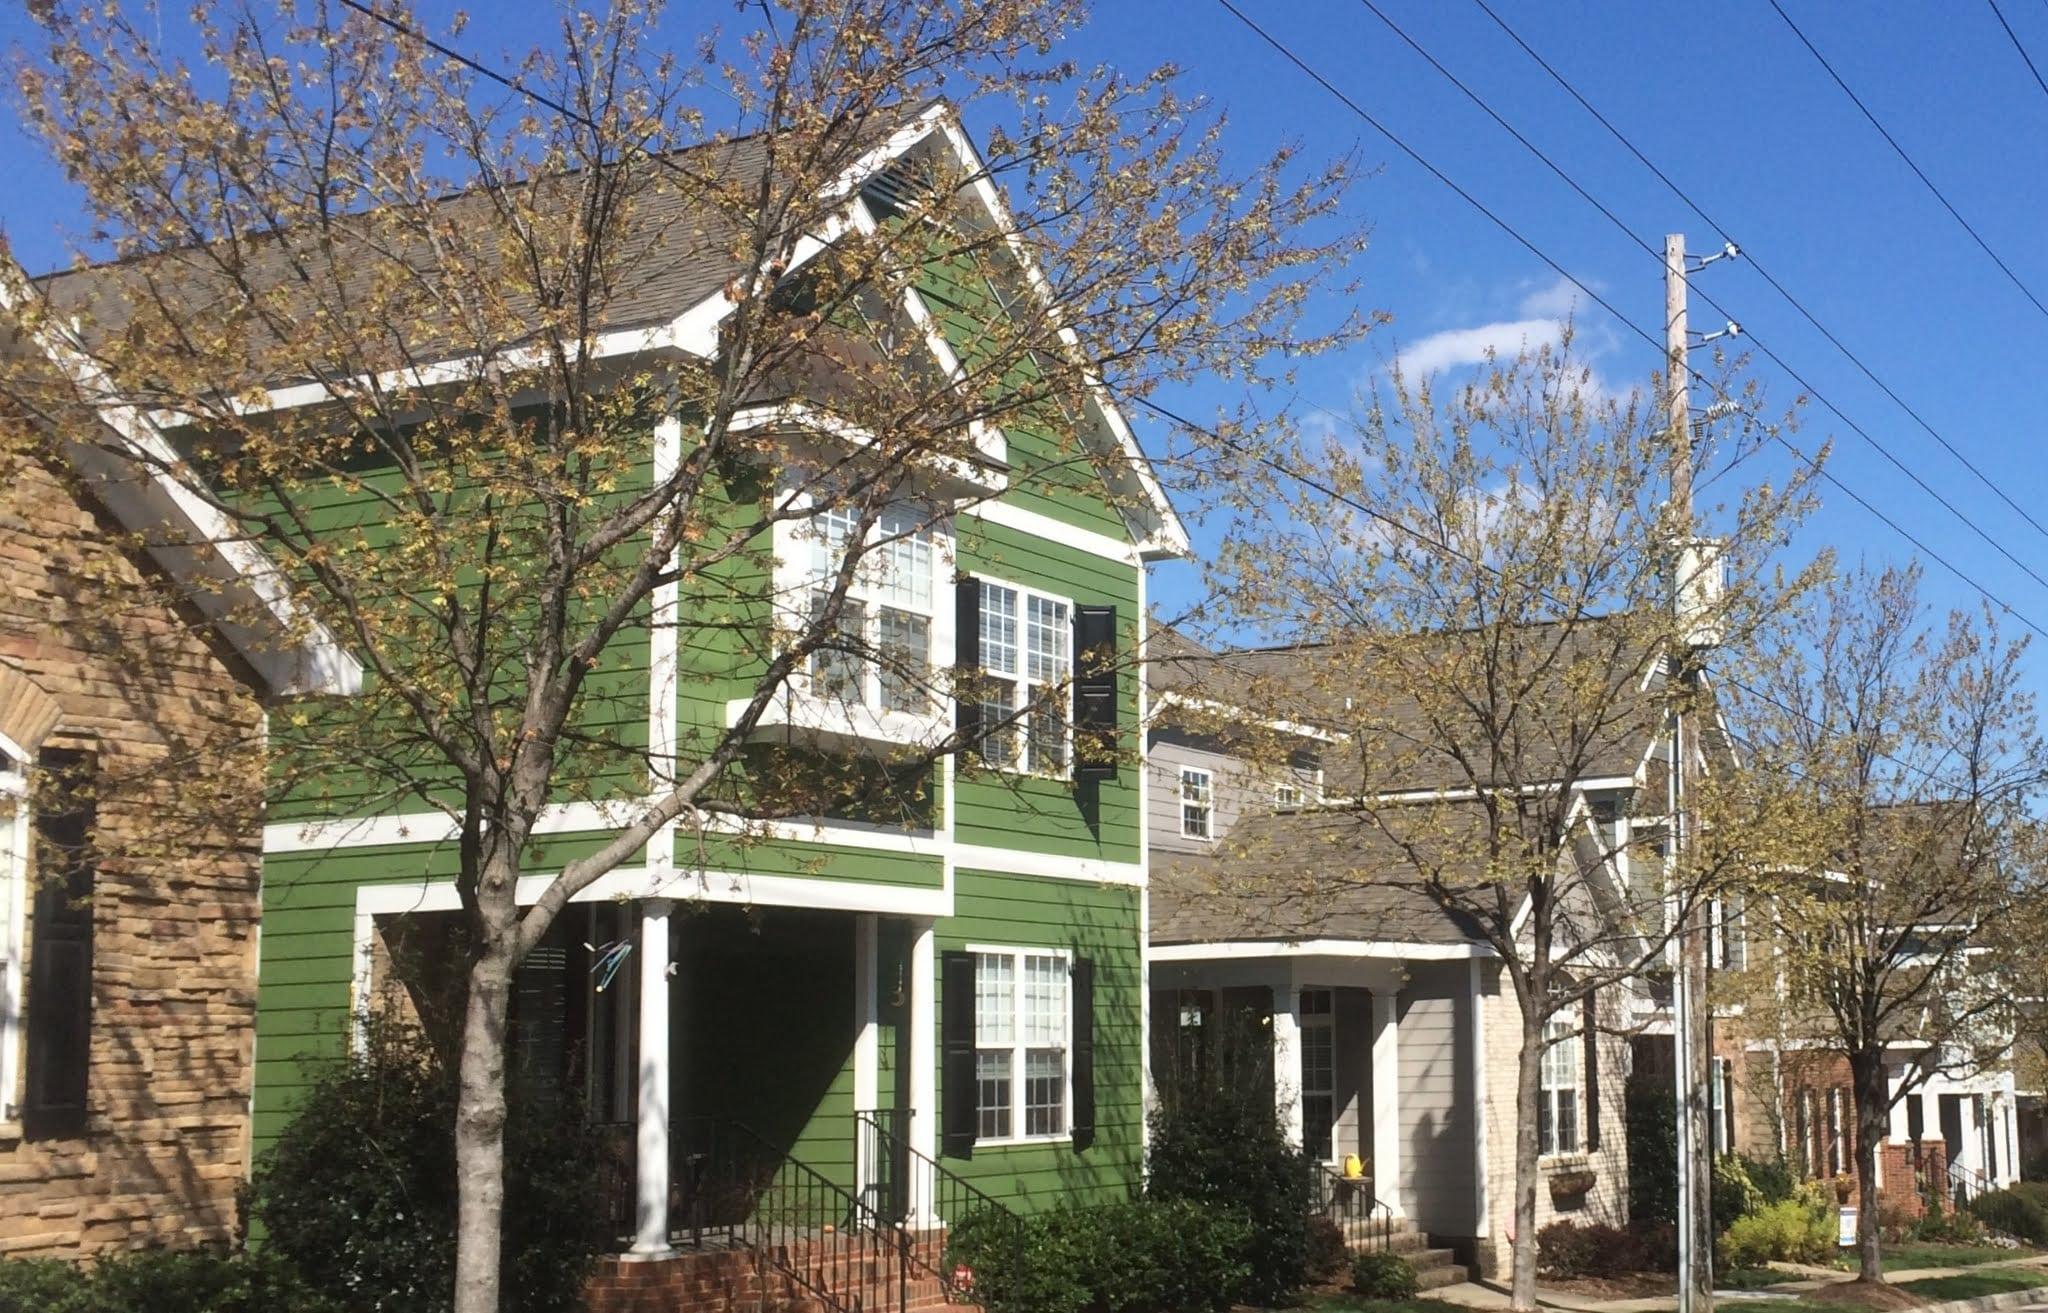 1218 N. Blount St. (Green House) , Mordecai Neighborhood, Best Raleigh Neighborhoods, Inside-the-Beltline, Mordecai